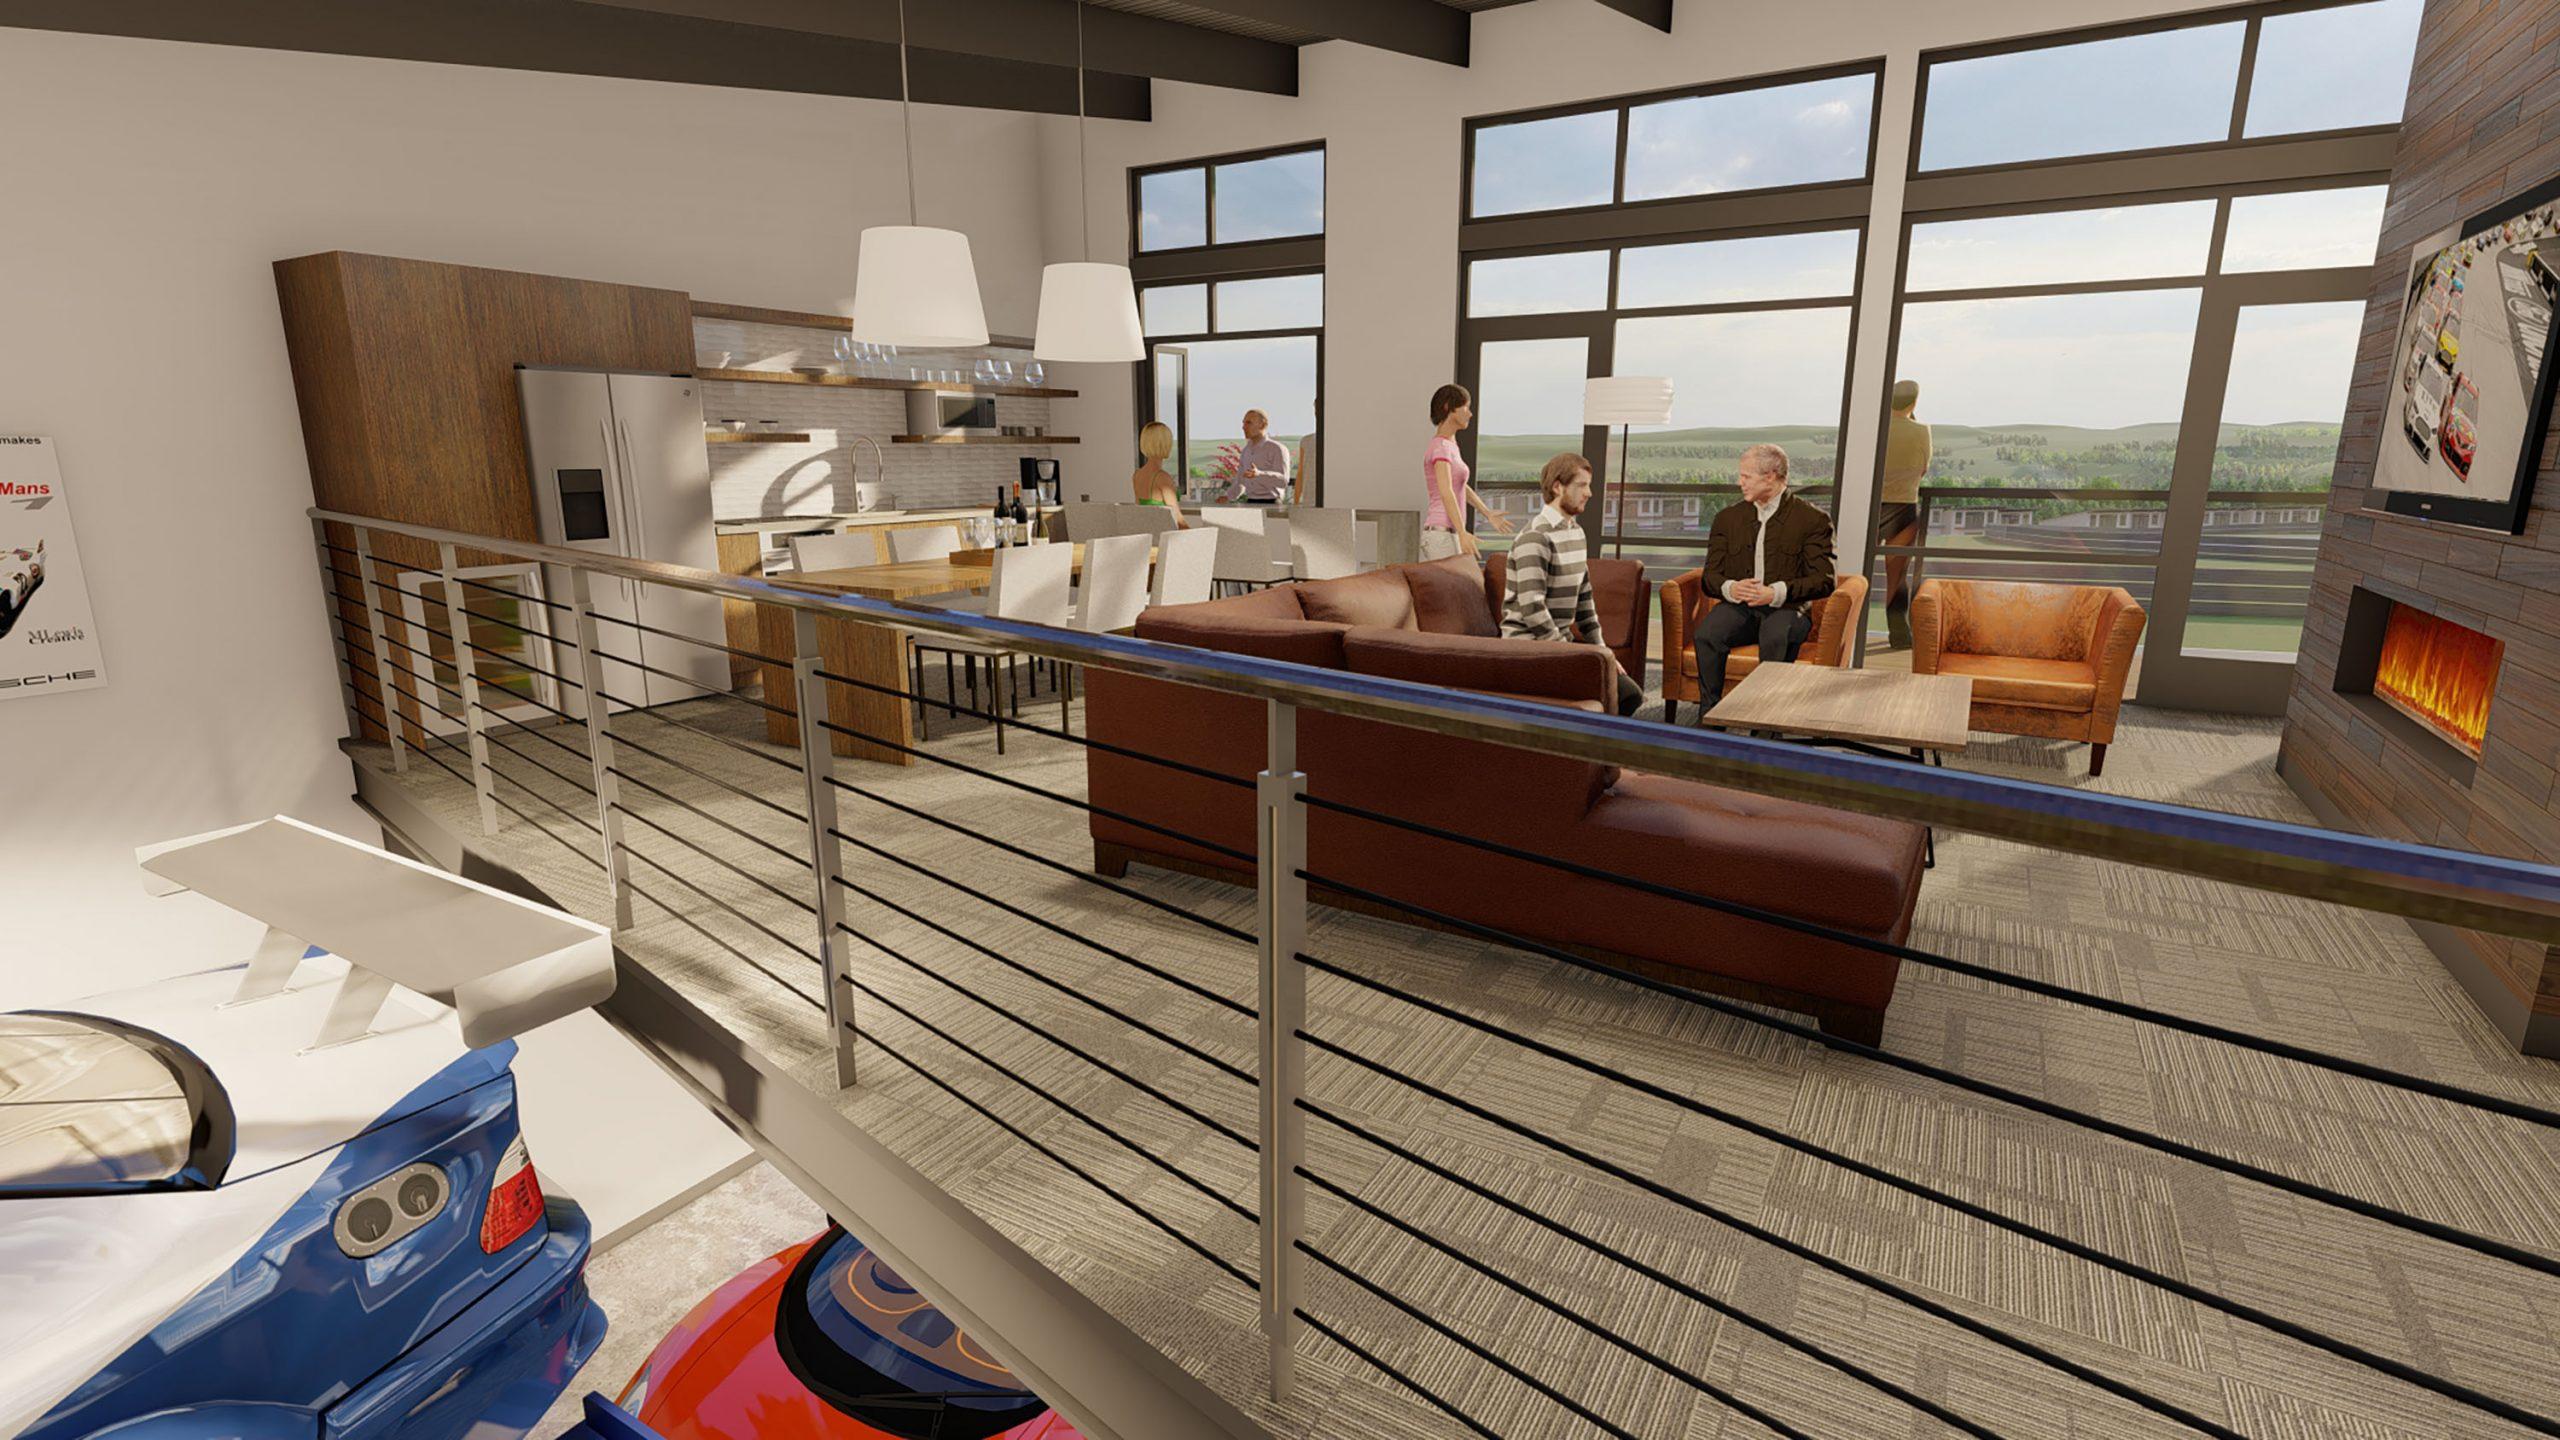 Autominiums condo rendering interior lounge bar area